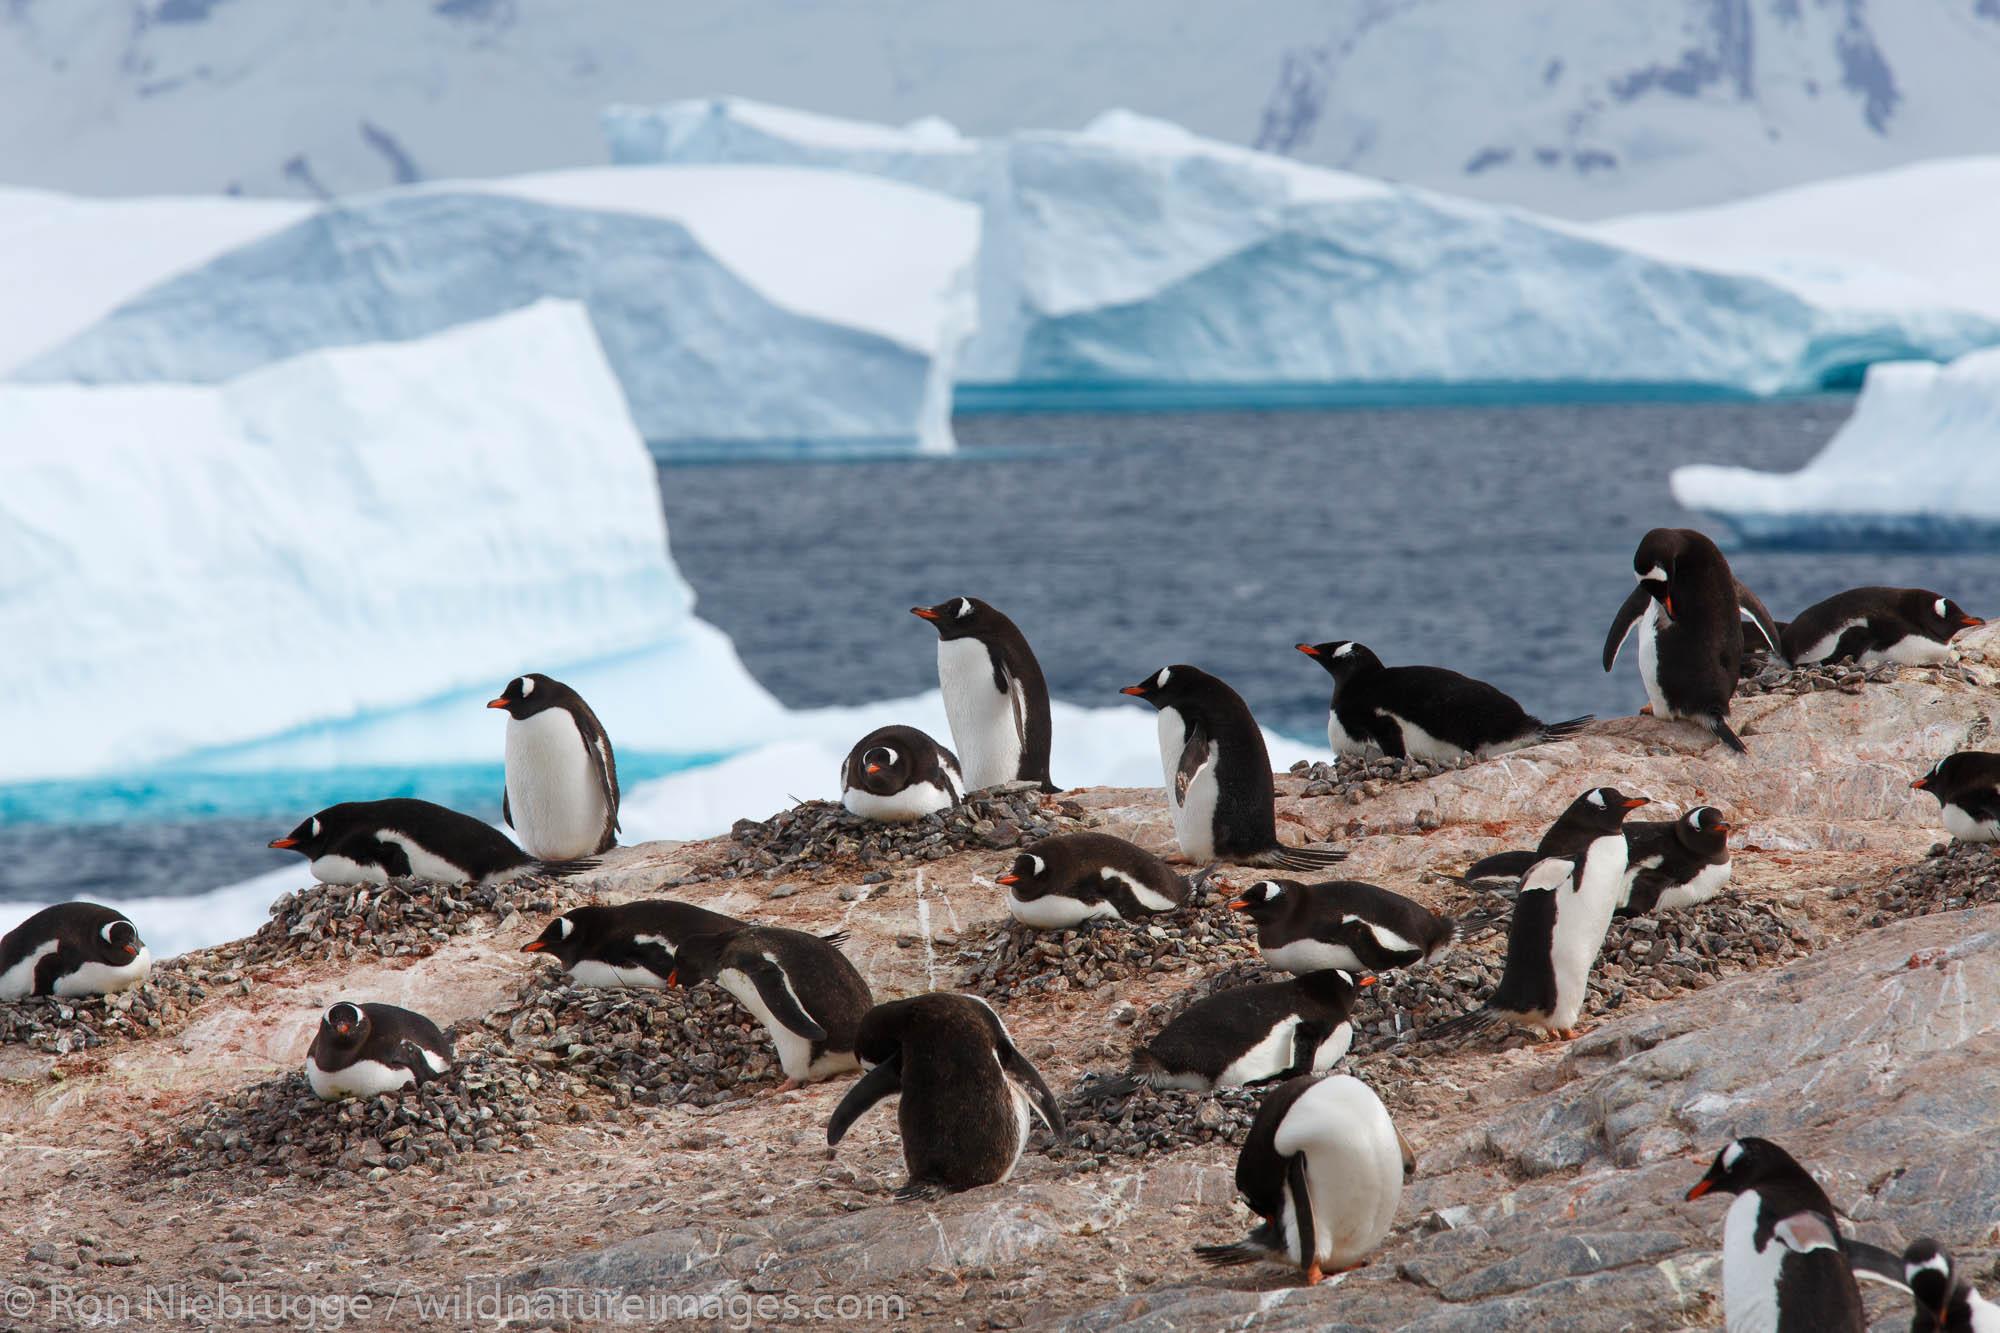 A Gentoo Penguin colony (Pygoscelis papua) on Cuverville Island, Antarctica.